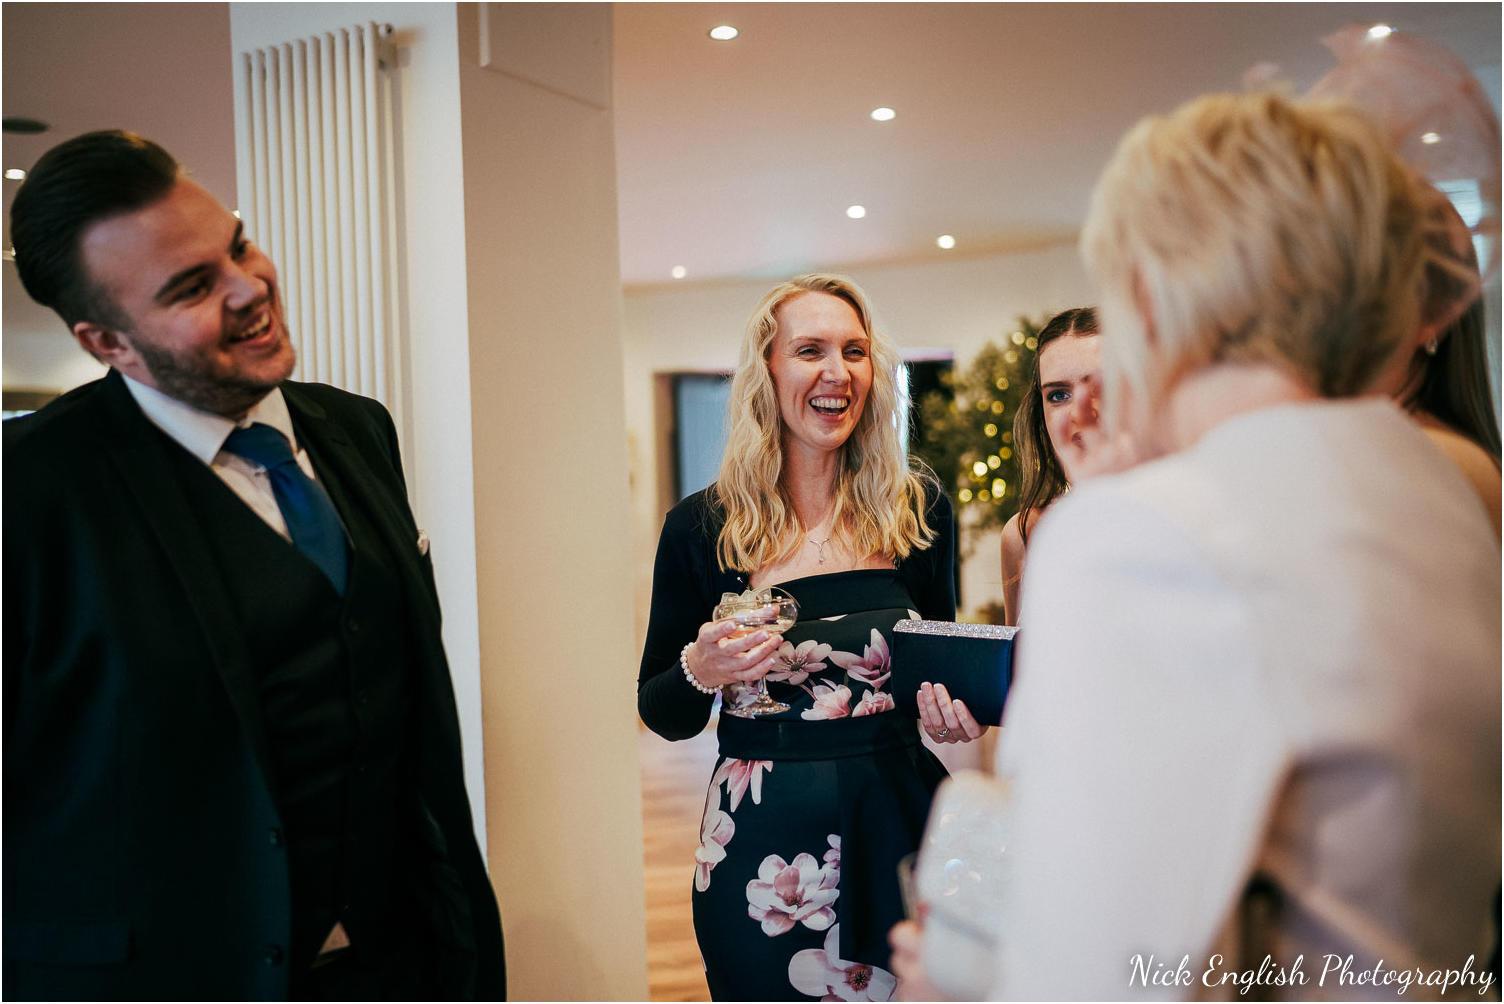 Mitton_Hall_Wedding_Photographer_2018-102.jpg